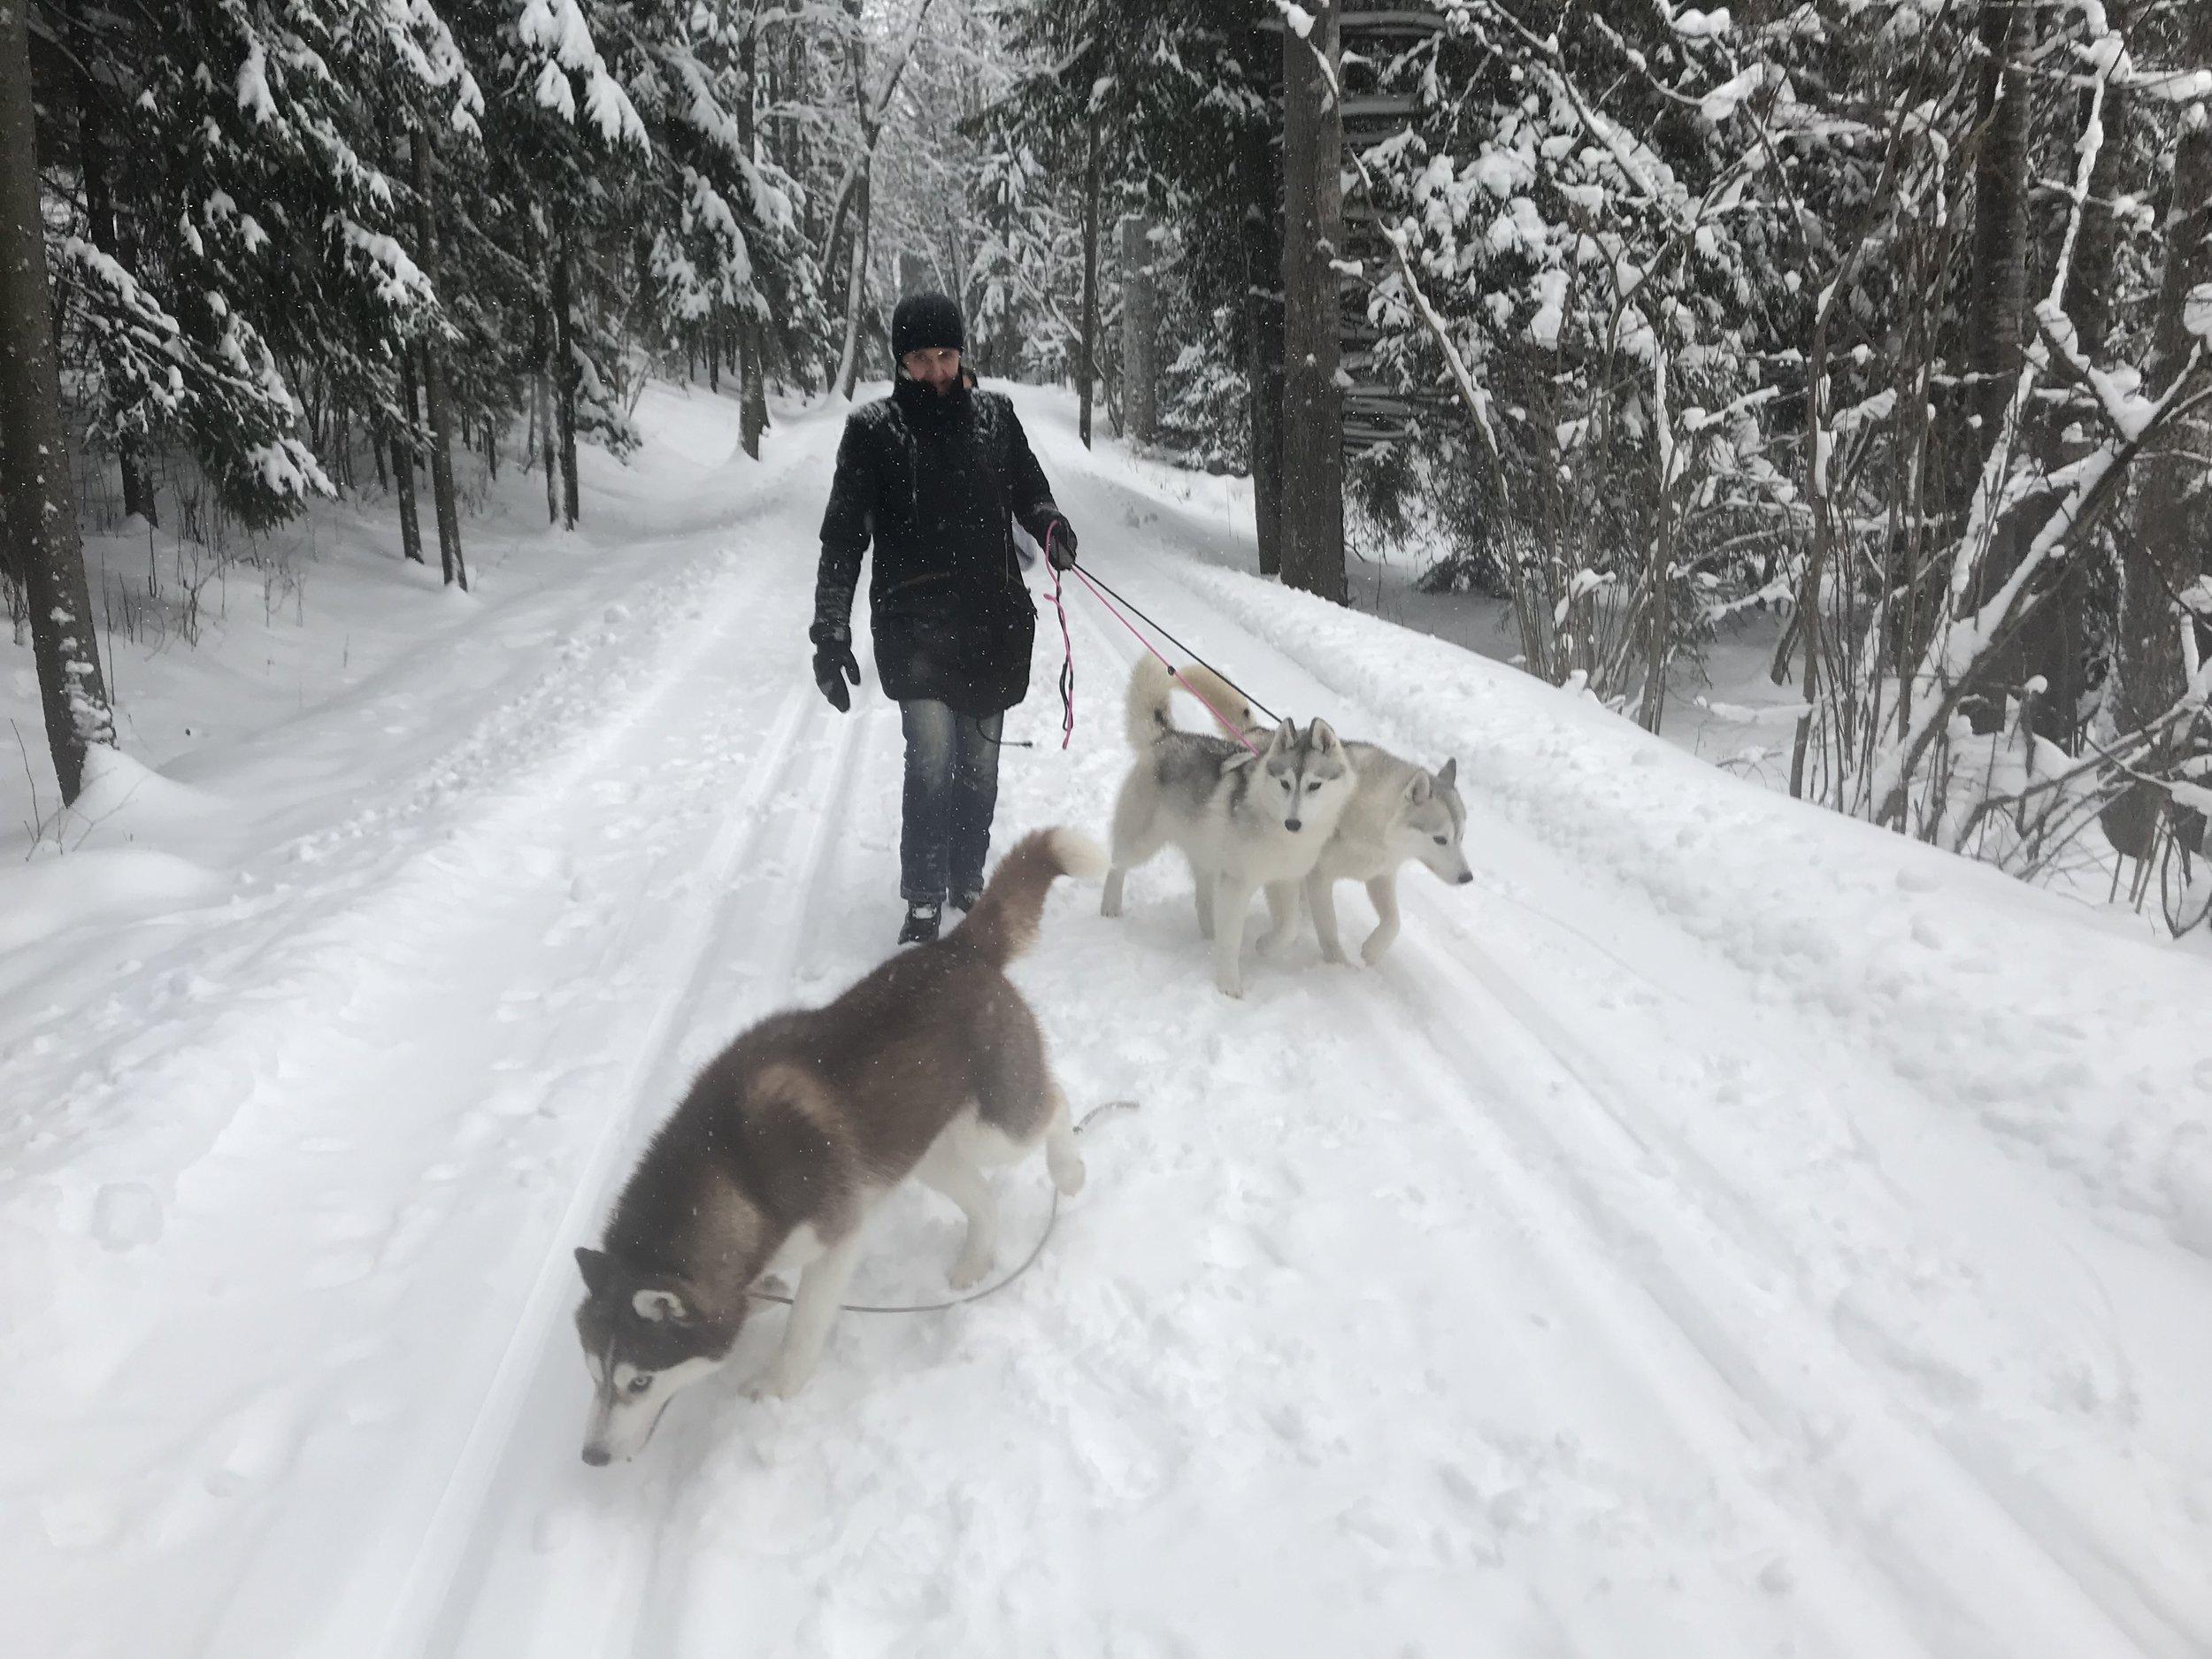 Katja with three of her huskies during the day of the photo shoot: Snow Angel Artico Encanto, Kuurakuonon Red Hot Chili Pepper On Ice (Antero) ja Mikhmakoen Ariadna (Ariadna)